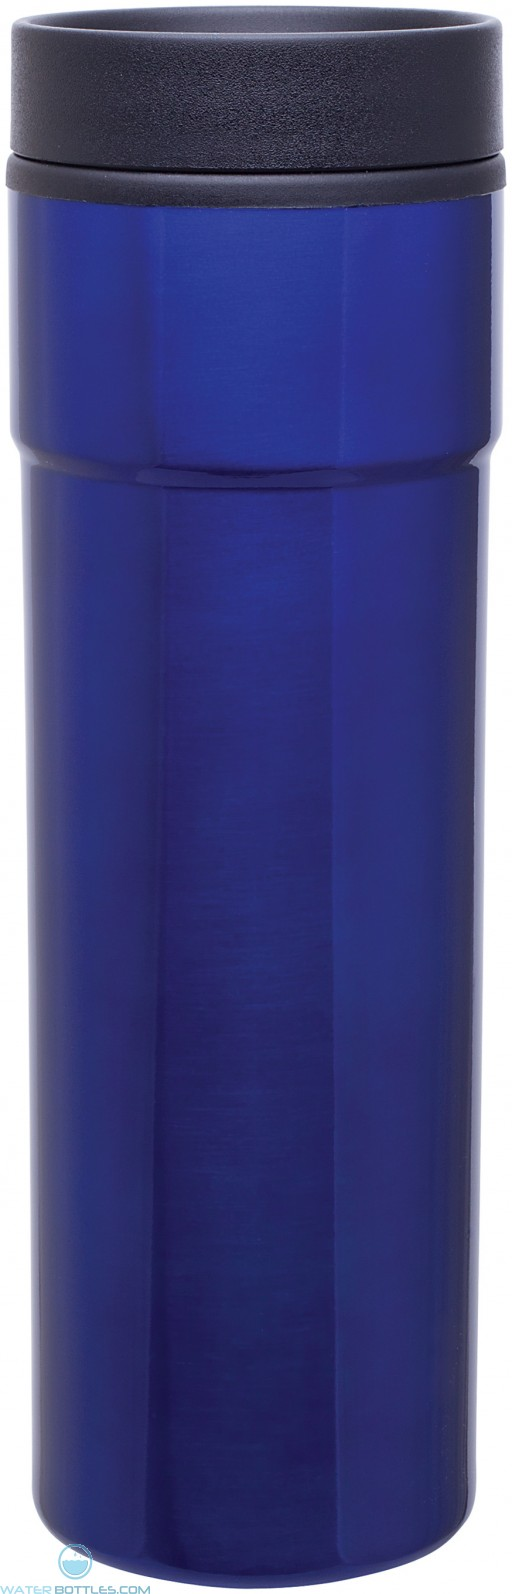 Foam Insulated Como Tumblers | 16 oz - Blue